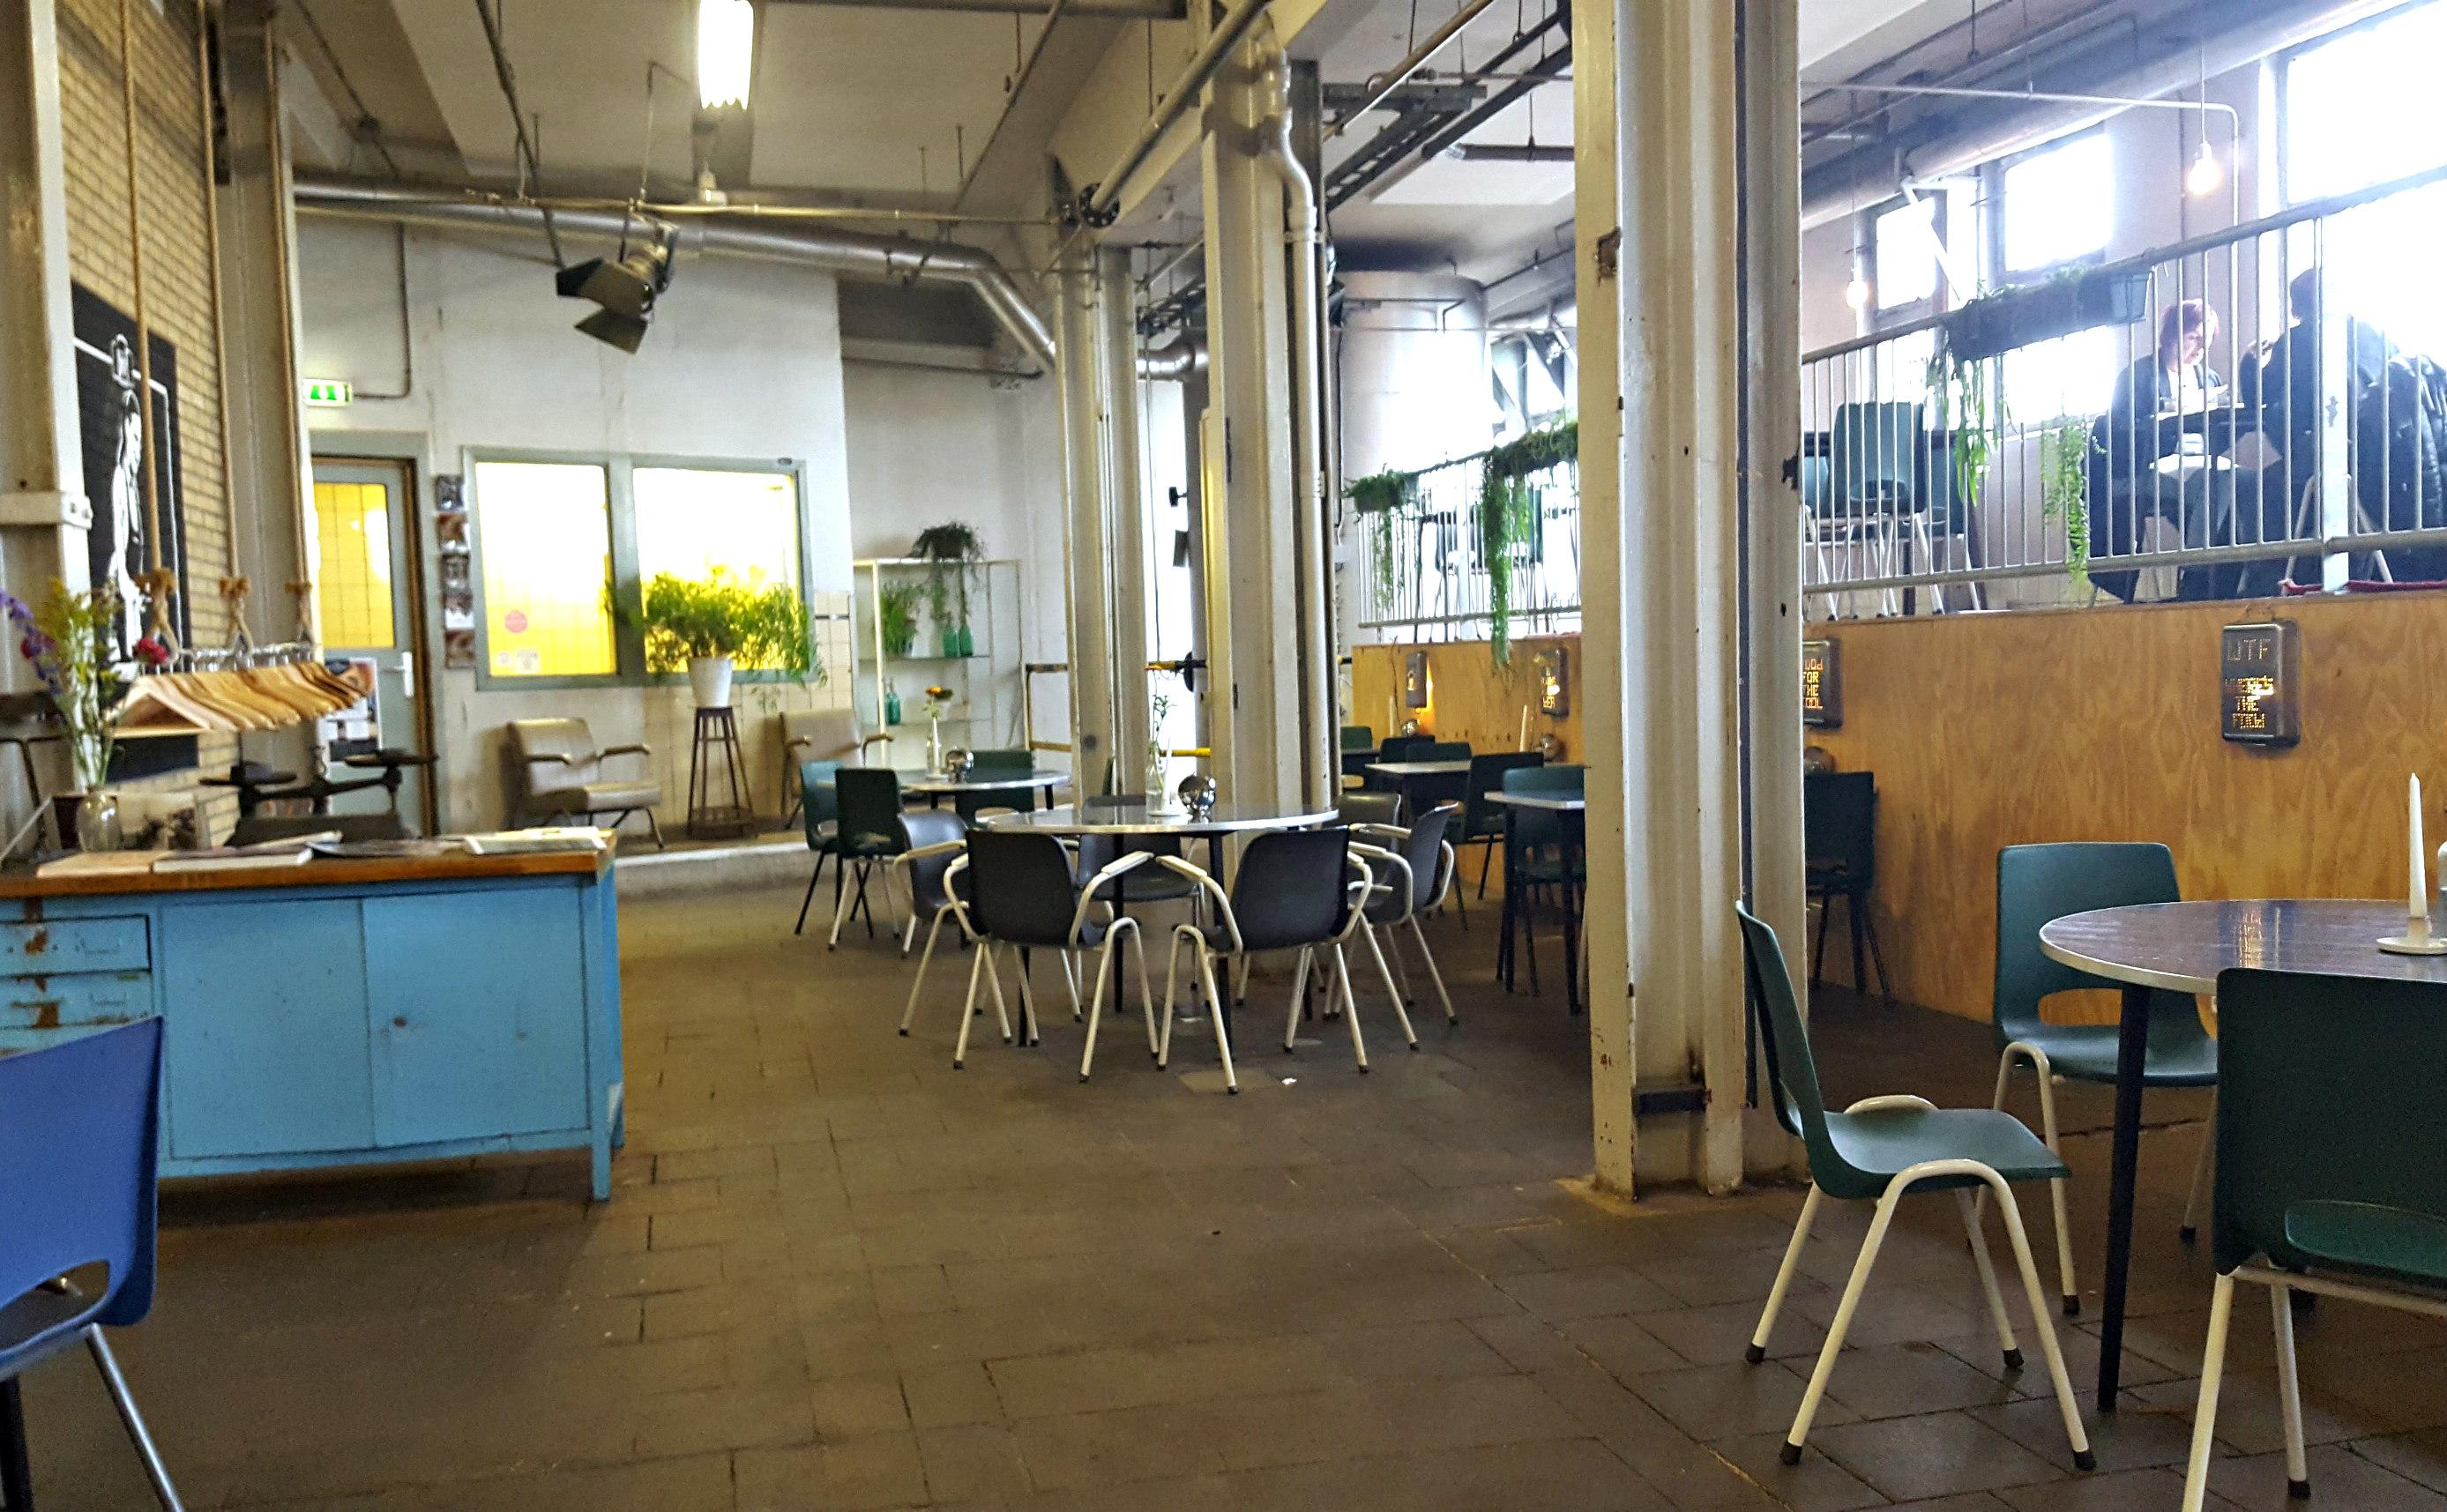 industriele interieur lunchen bij meesterproef hotspot nijmegen